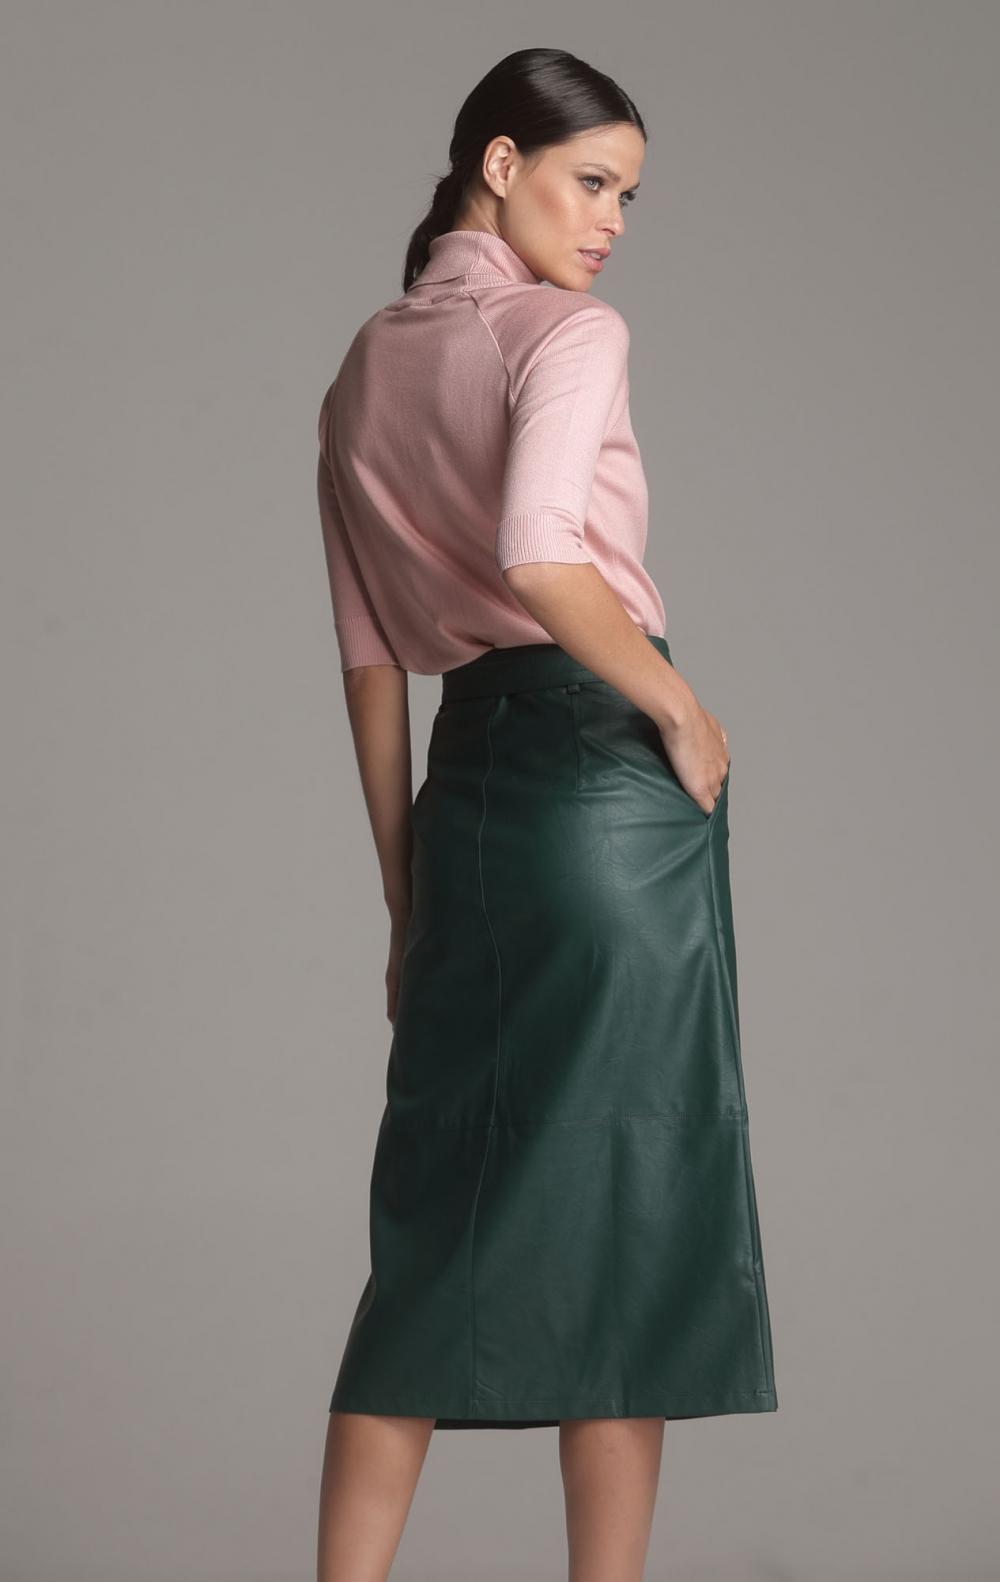 Blusa Tricot Gola Rosa  - Foto 2